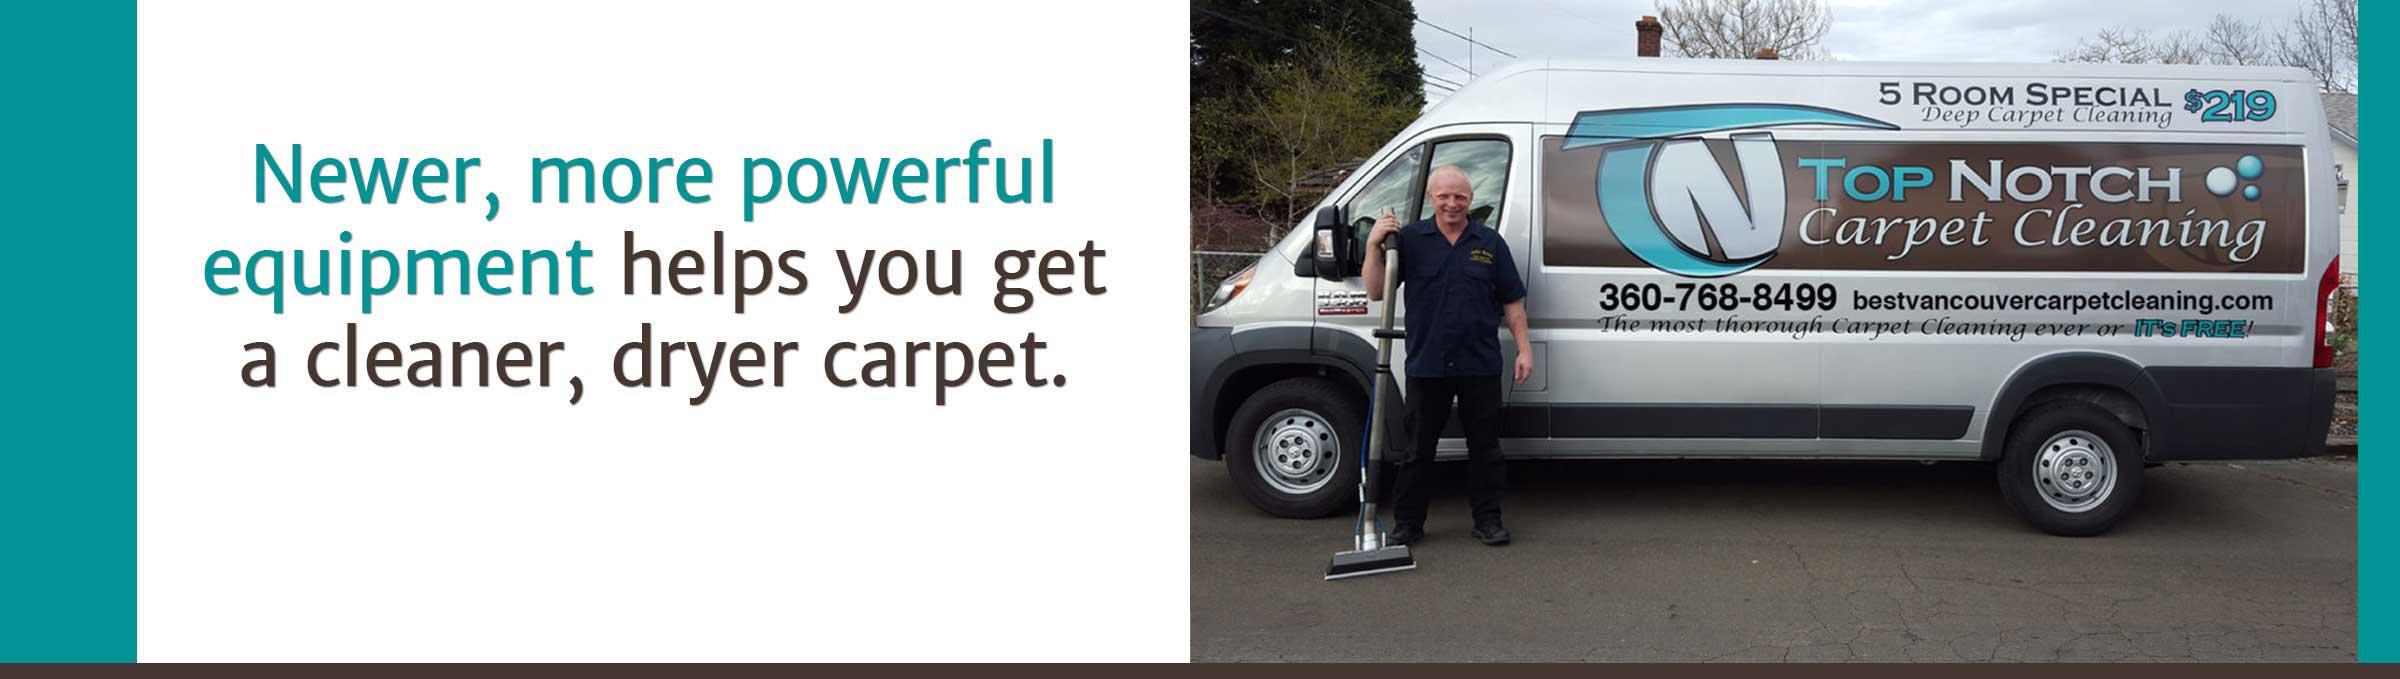 Top Notch Carpet Cleaning Van in Vancouver WA & Camas WA